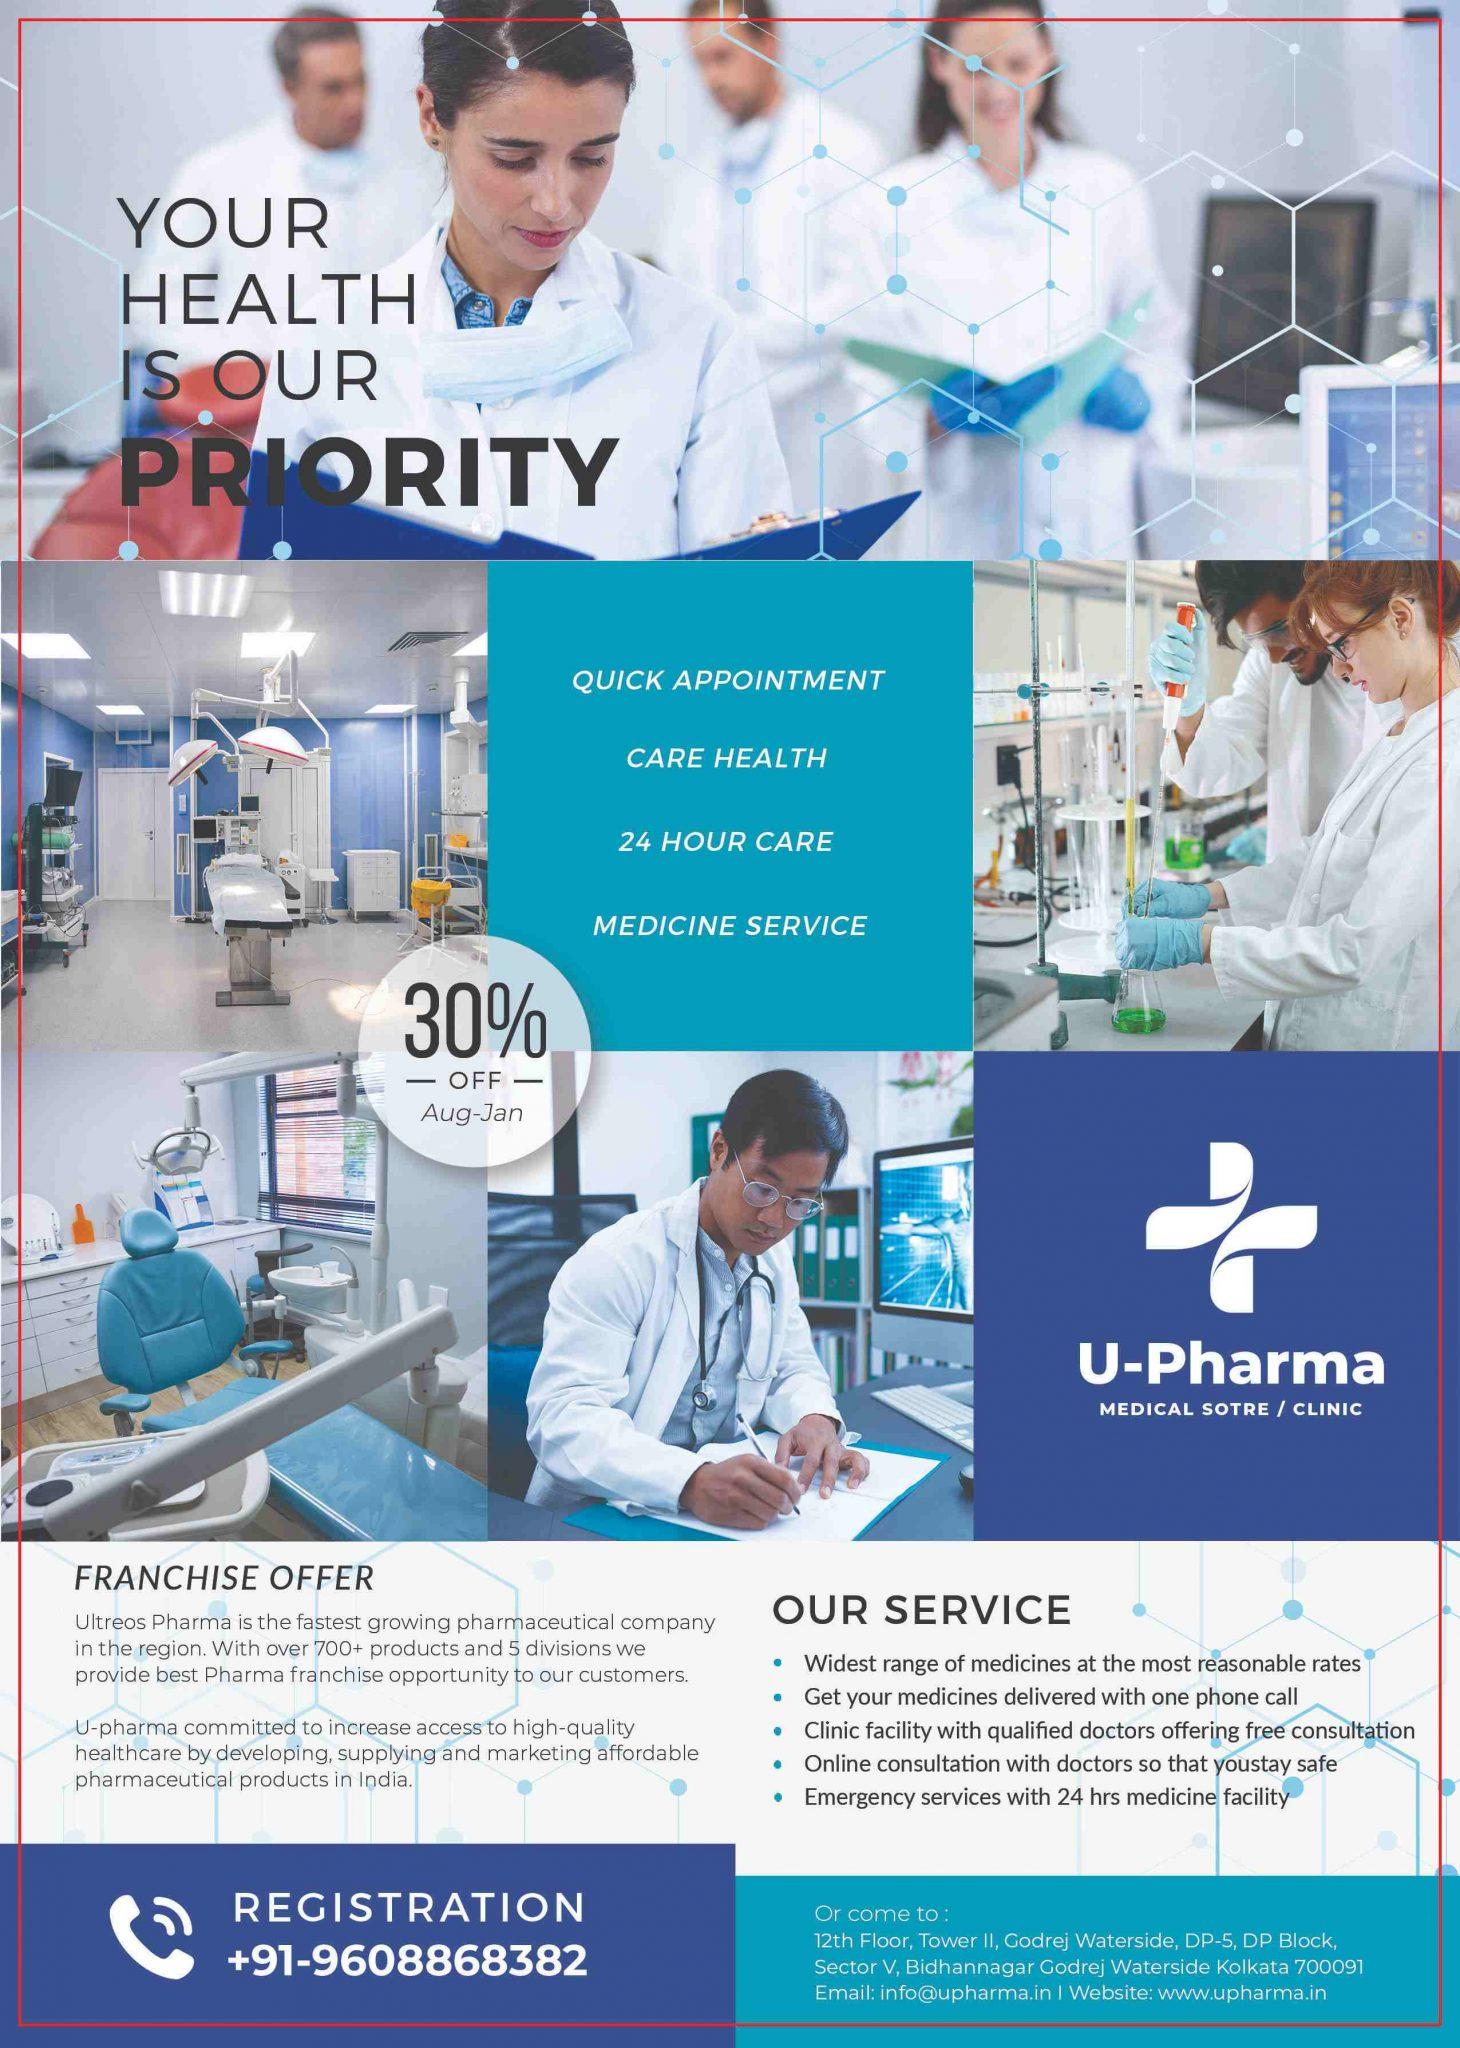 ULTREOS Pharmacy